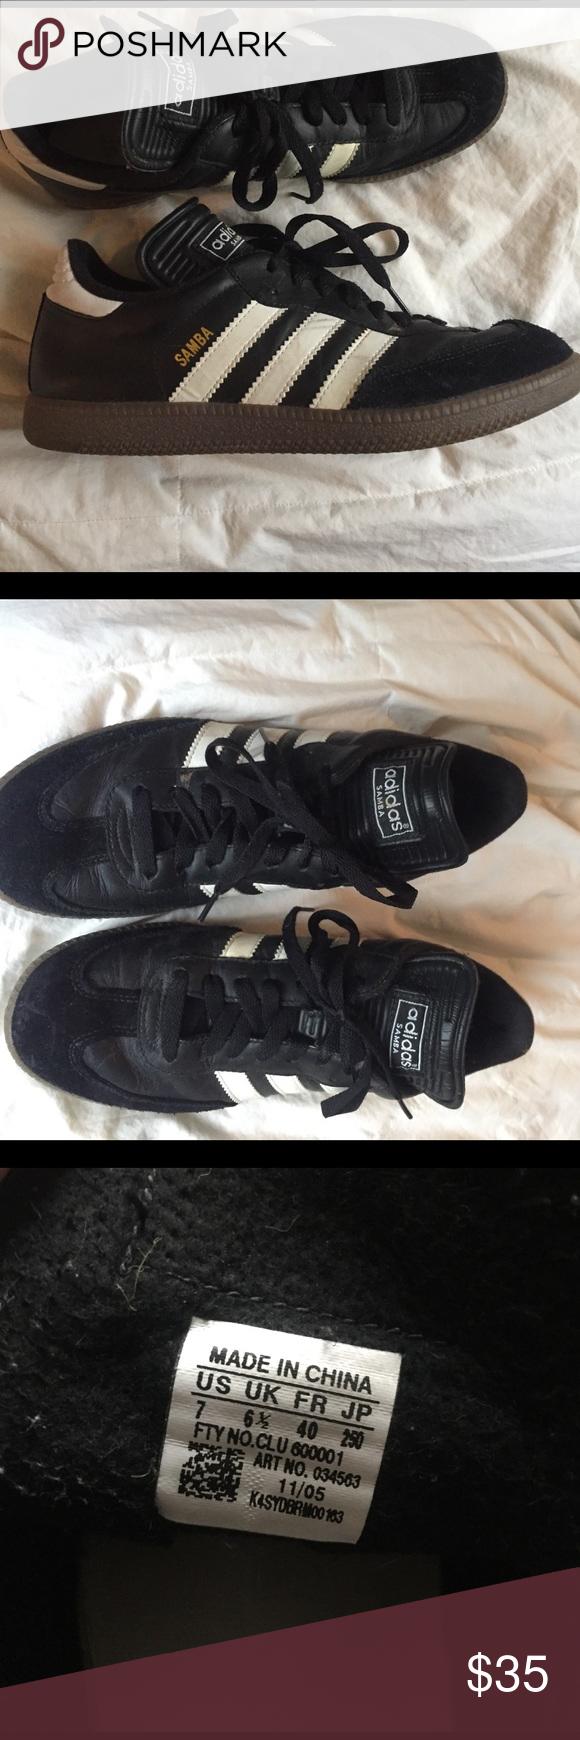 adidas sambas numero 7 (uomini), pinterest le adidas, scarpe